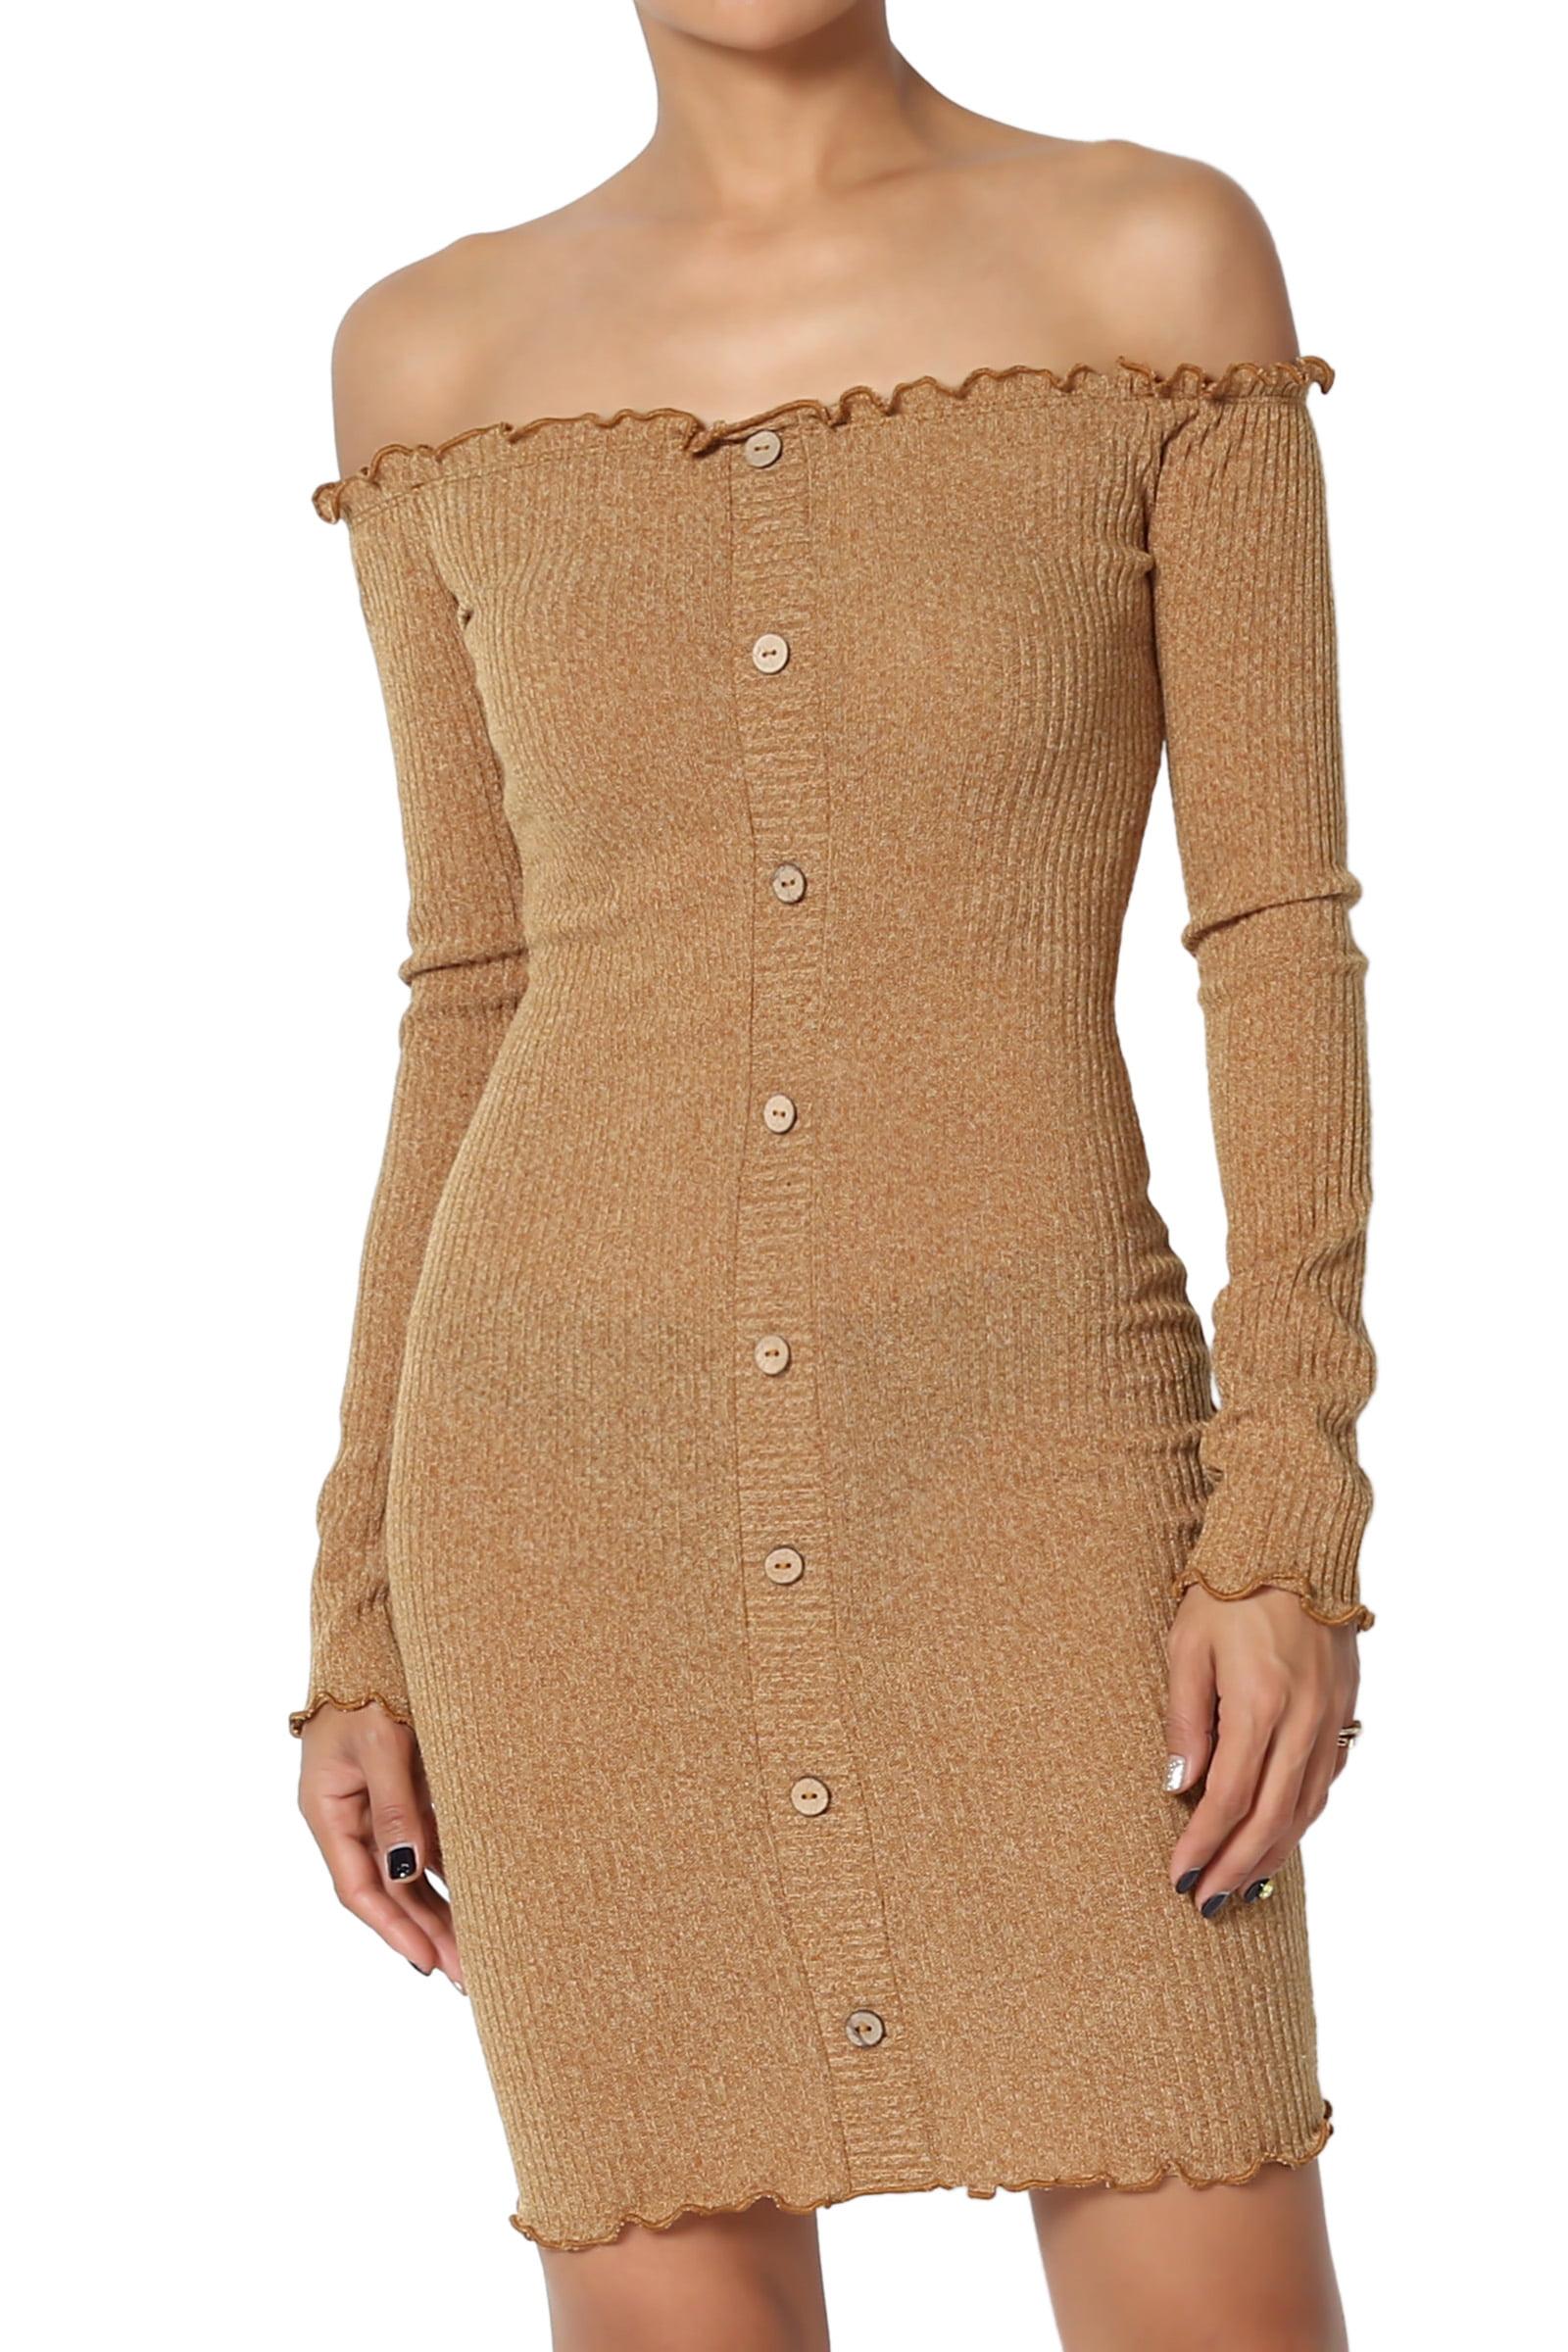 ce23b1deed7f TheMogan - TheMogan Junior s Long Sleeve Off Shoulder Stretch Ribbed Knit  Bodycon Mini Dress - Walmart.com